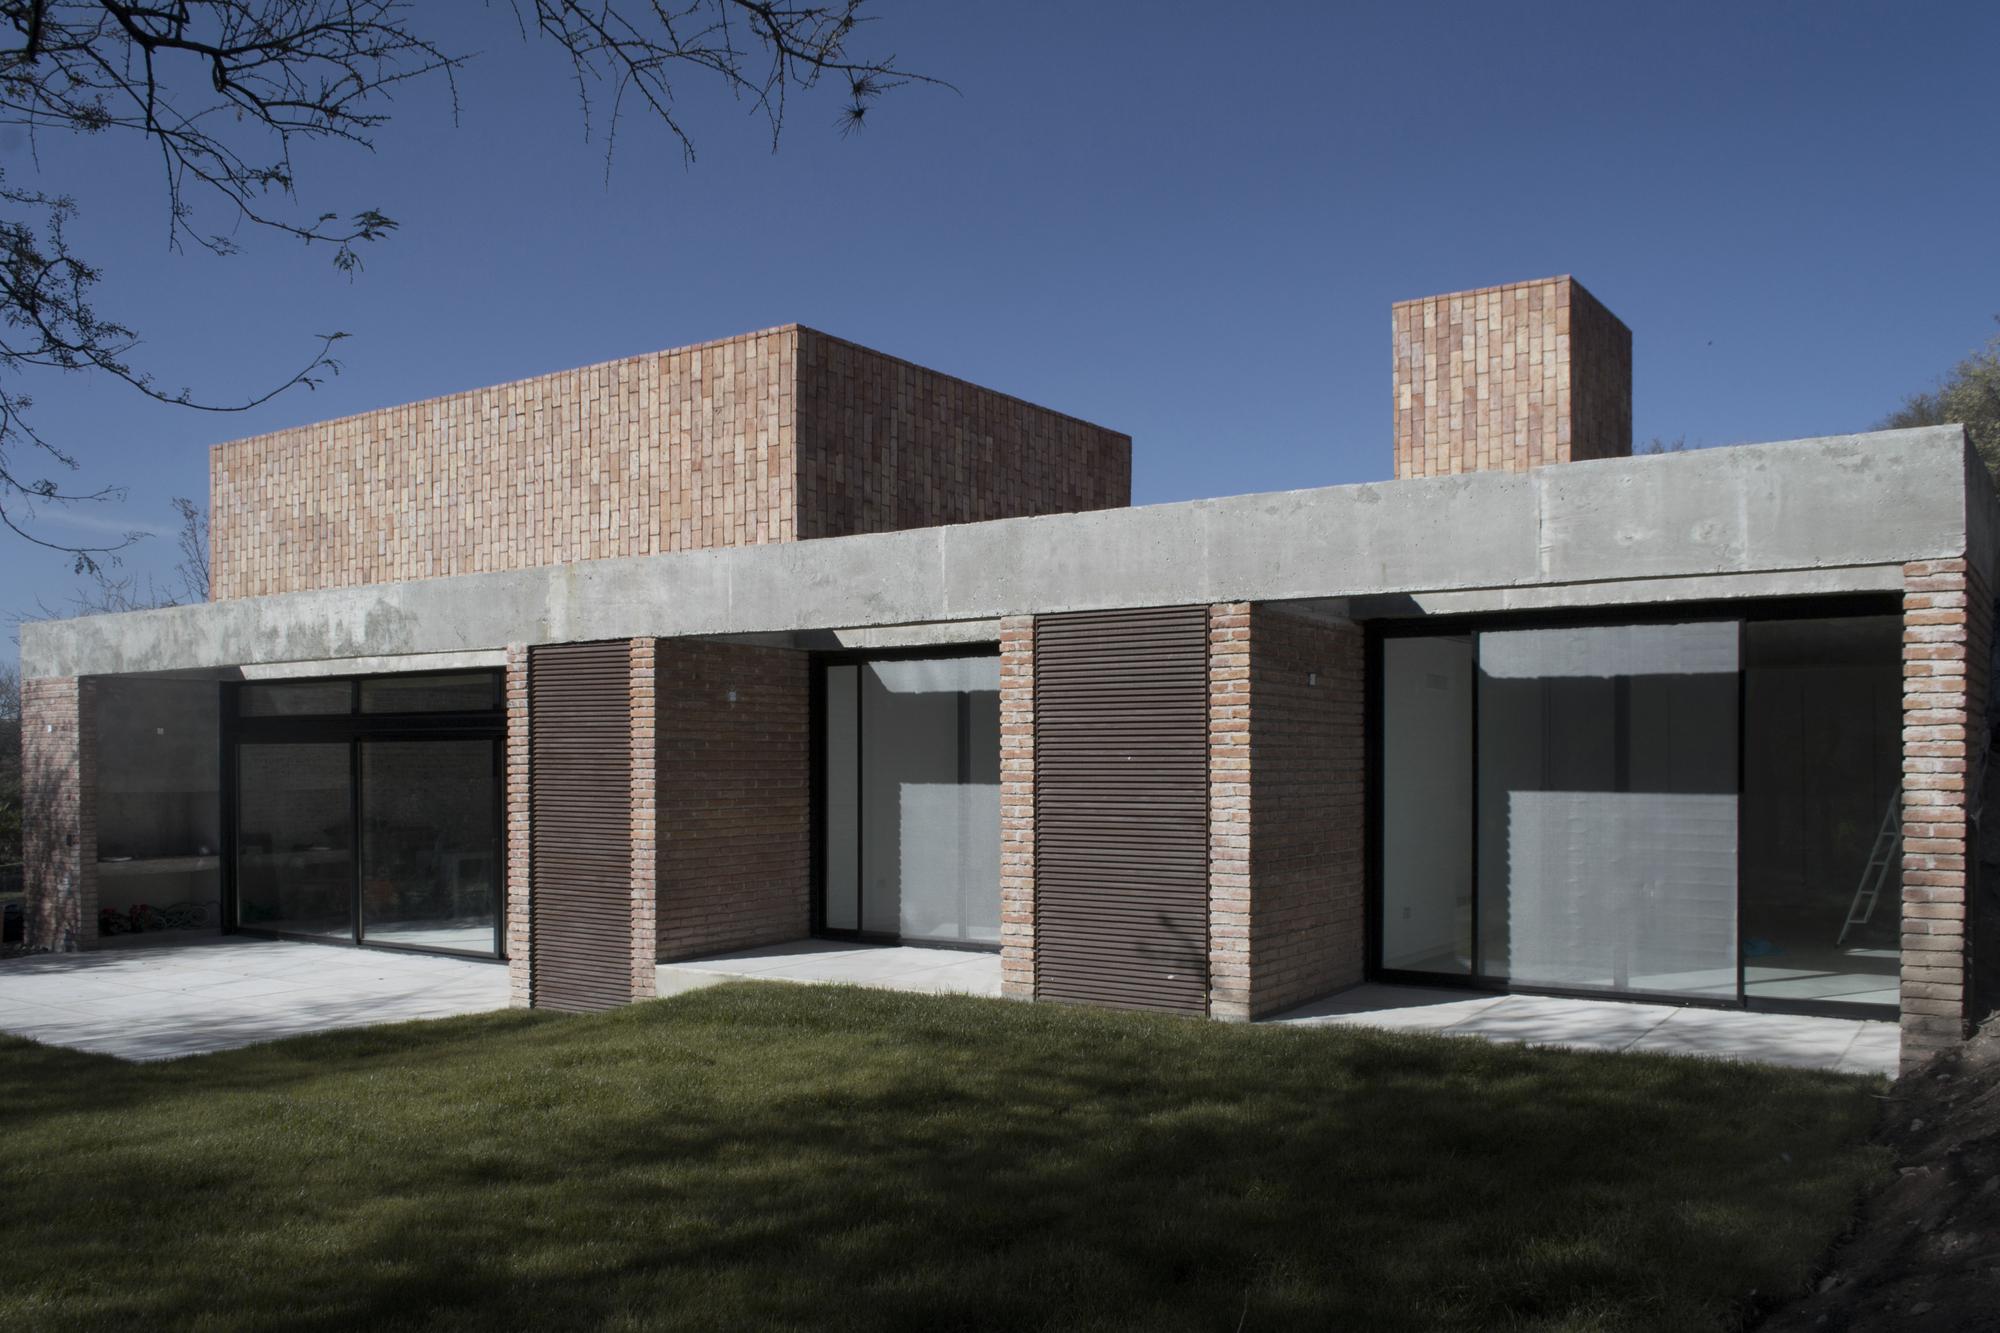 Galeria de casa gpl estudio blt 8 - Consumo gpl casa ...